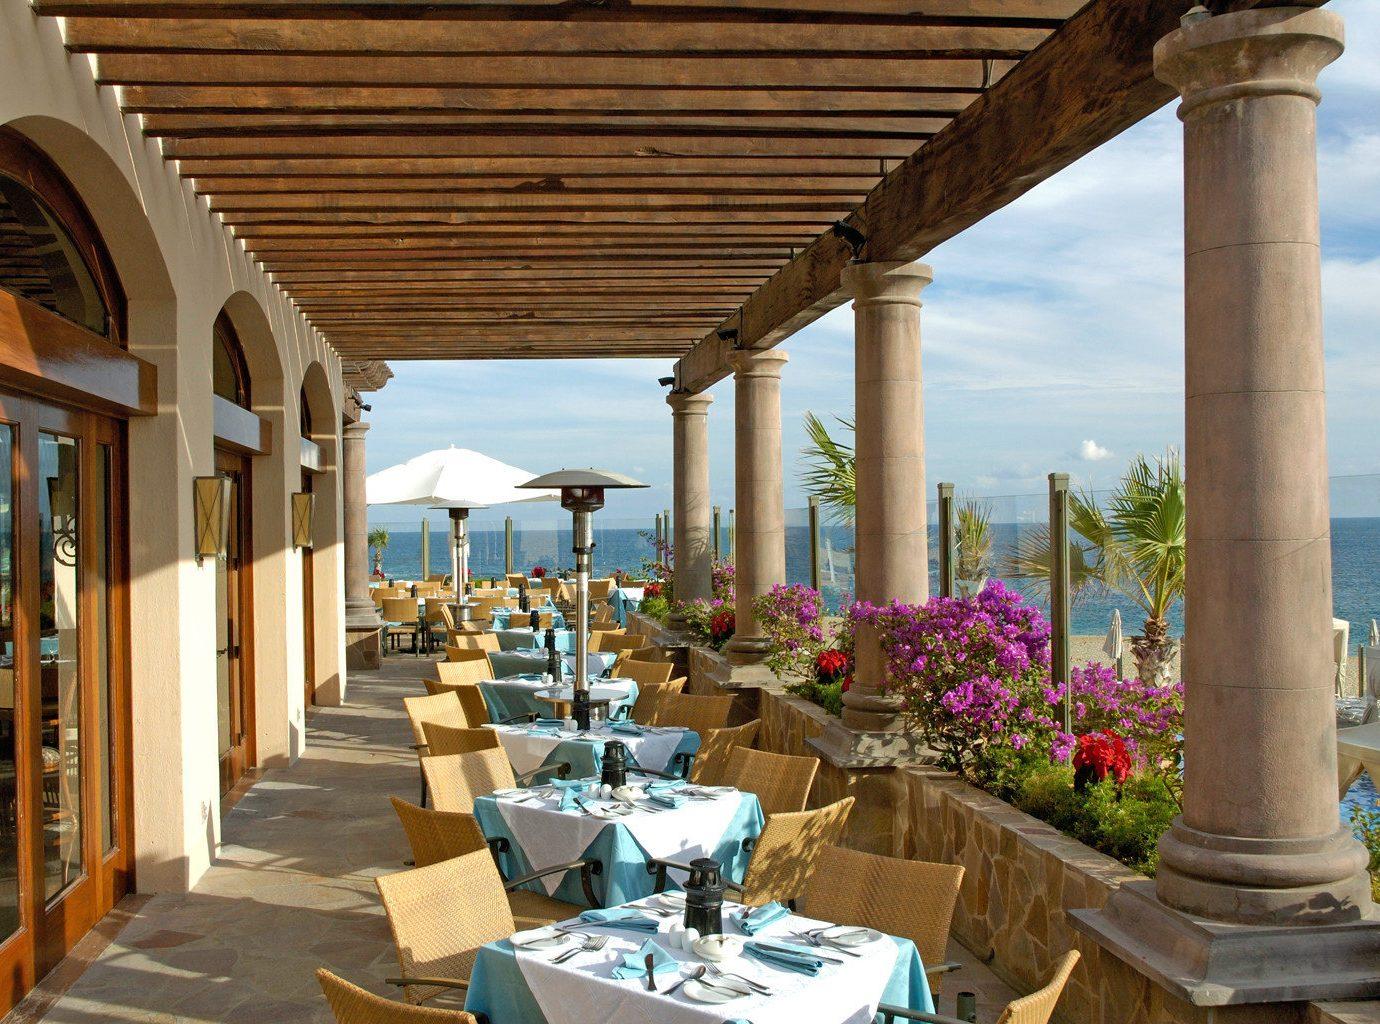 Outdoor dining at Pueblo Bonito Sunset Beach